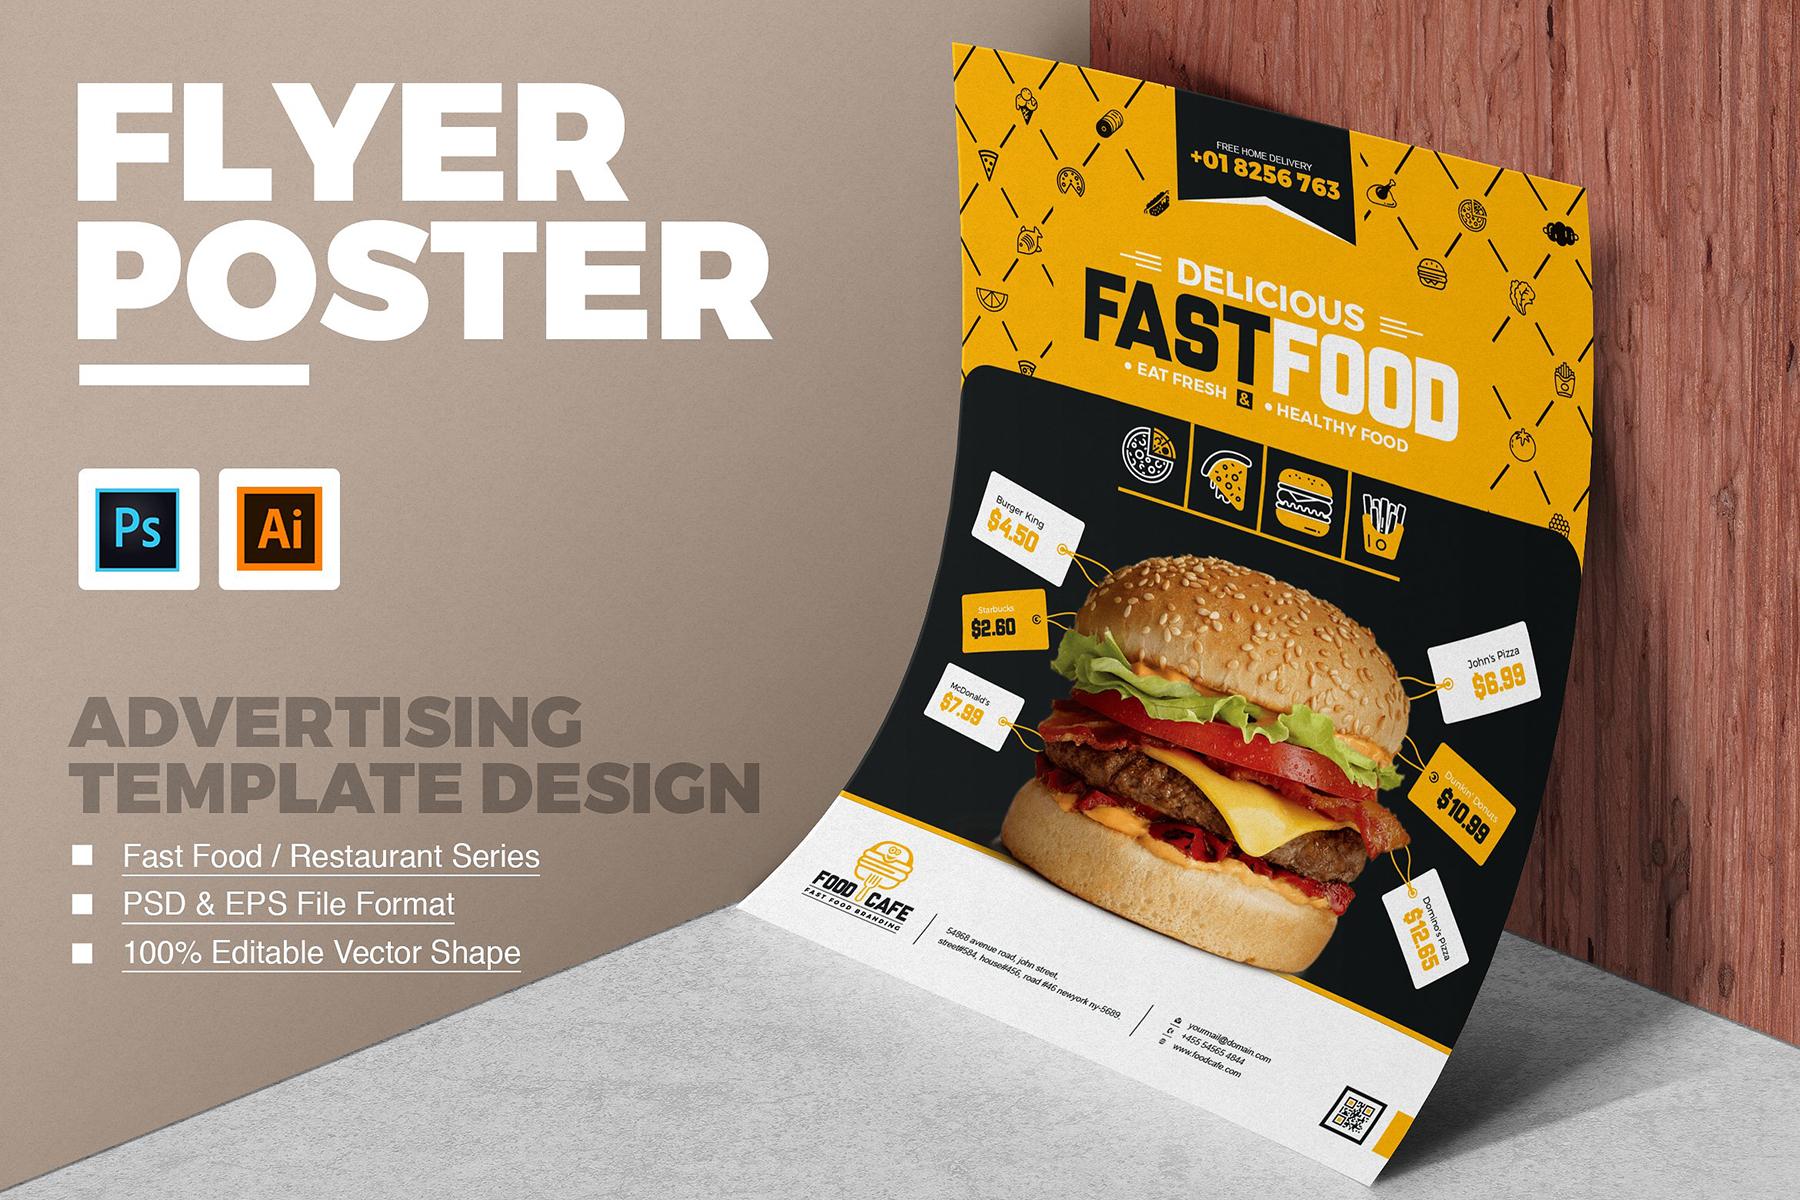 Flyer Template Bundle | 10 Flyer Design Corporate Identity ...